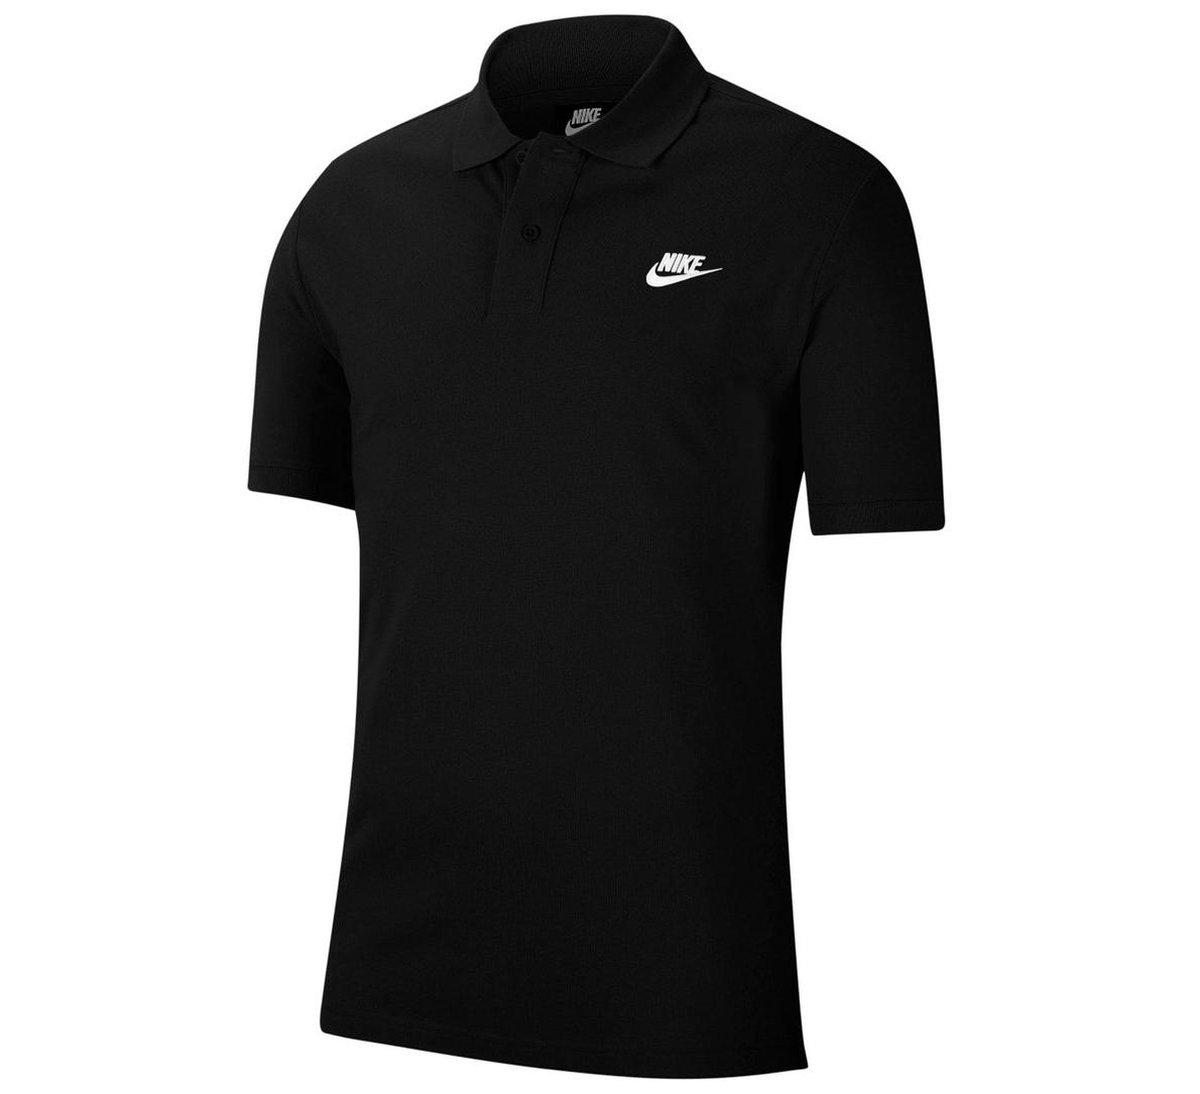 Nike Sportswear Ce Polo Matchup Pique Poloshirt Heren - Maat XL